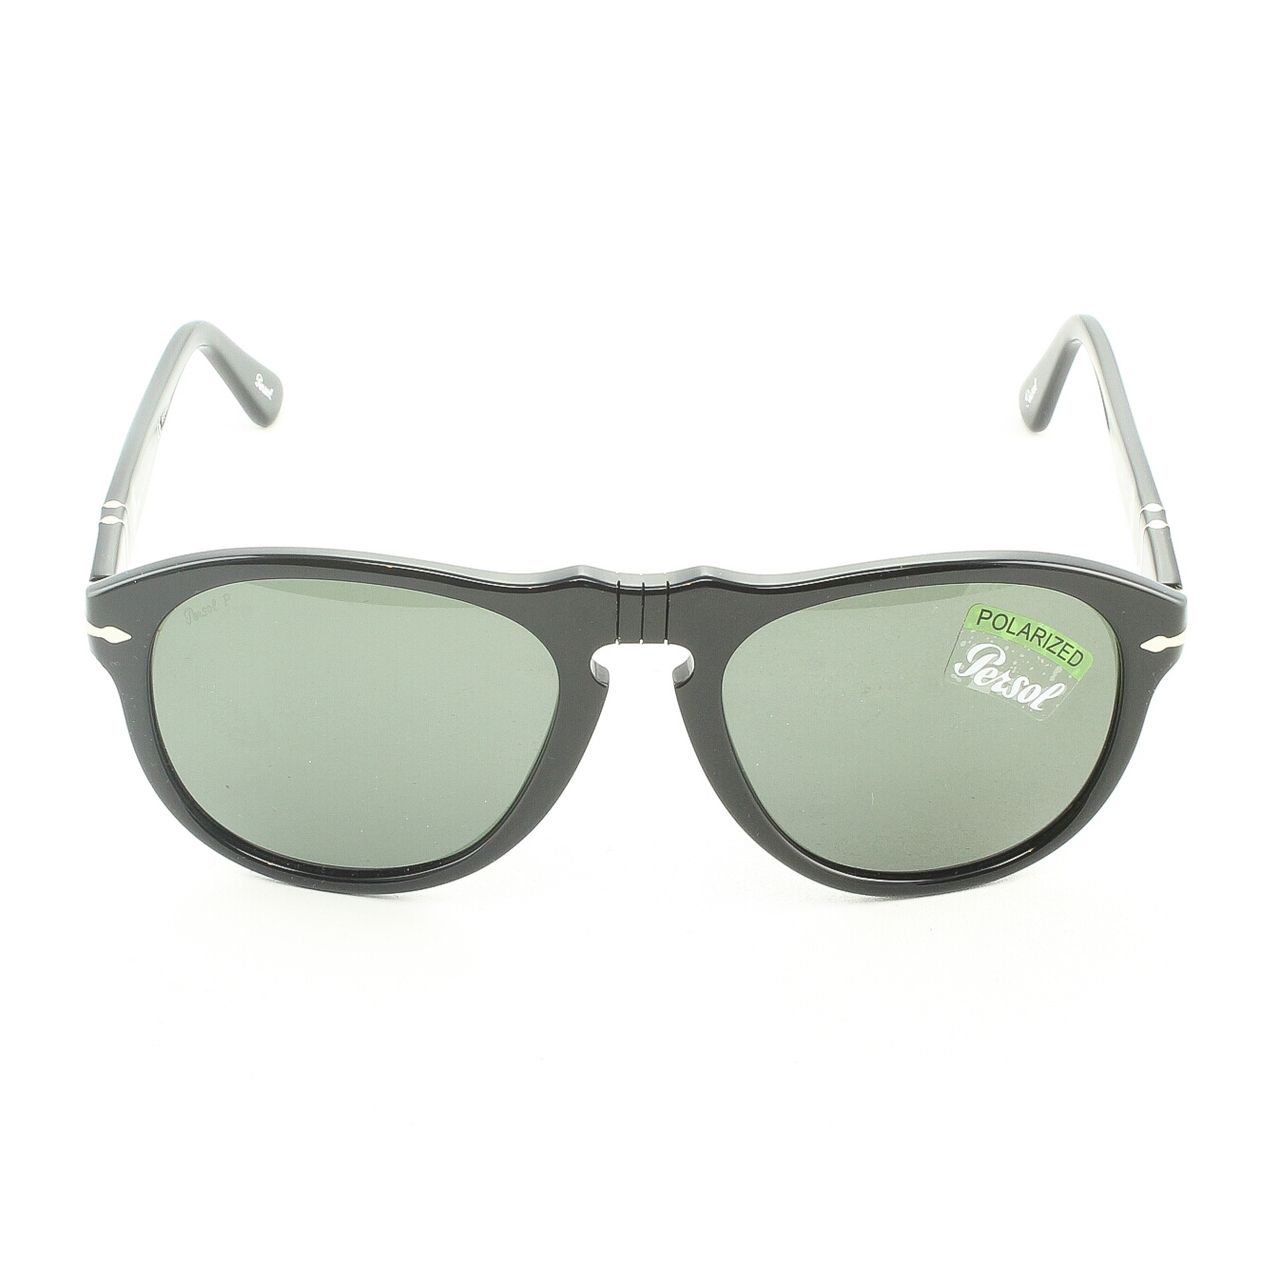 52581fc920 Persol PO0649 95 58 56mm Black Sunglasses with Grey Green Polarized Lenses  - Theaspecs.com